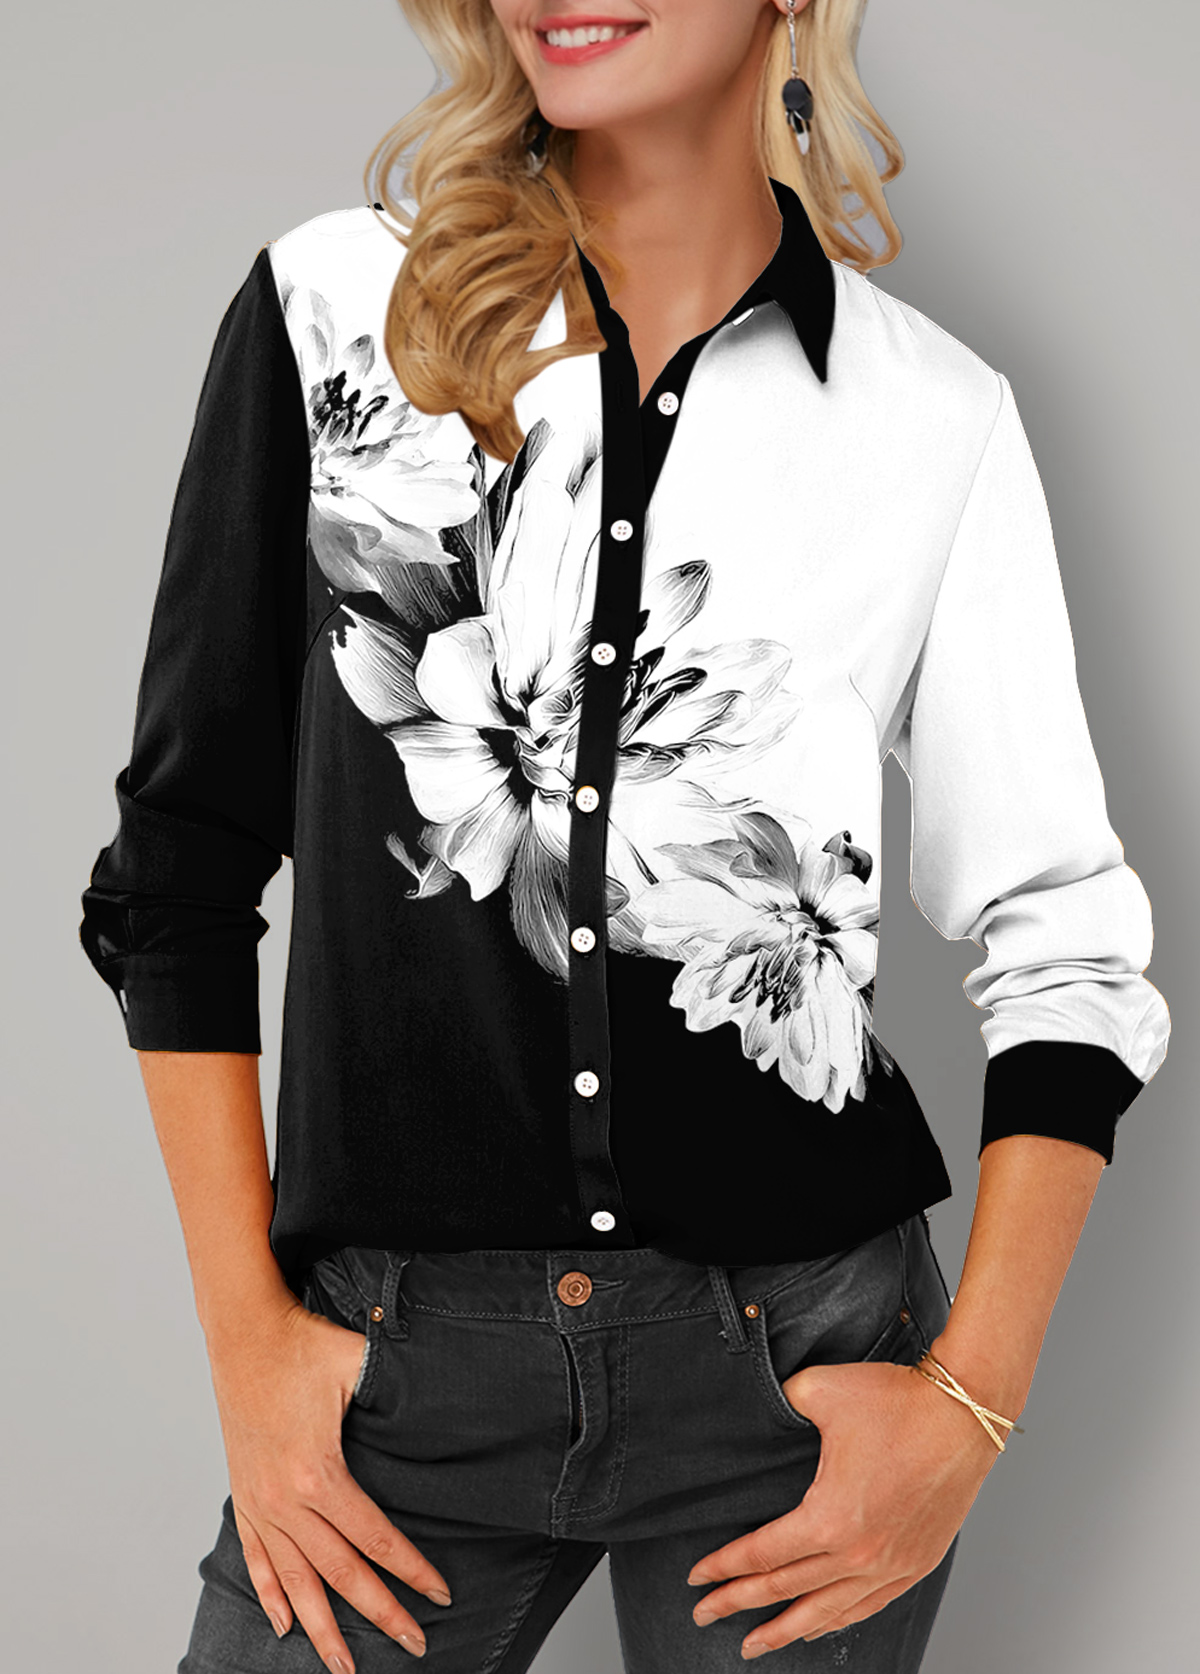 ROTITA Floral Print Turndown Collar Button Up Blouse